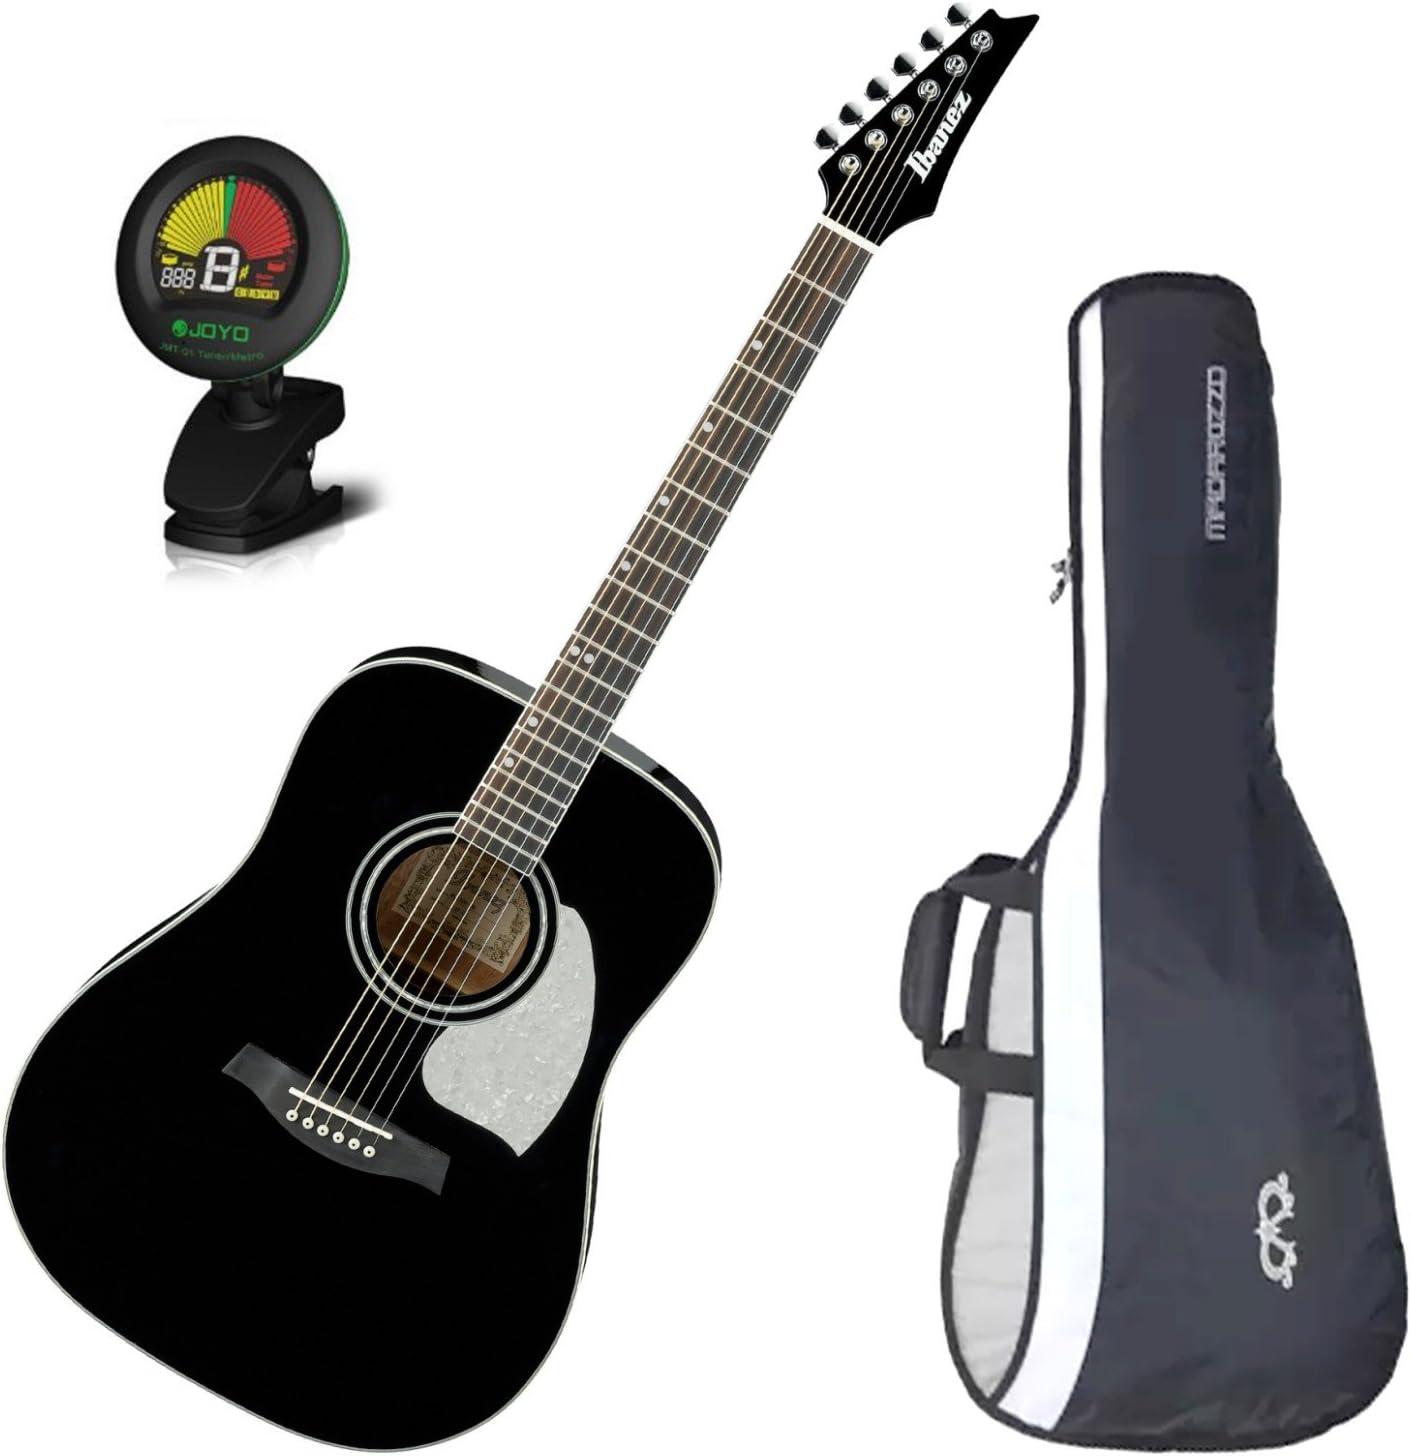 Ibanez ls300bk Lonestar guitarra acústica Negro brillante w/bolsa ...